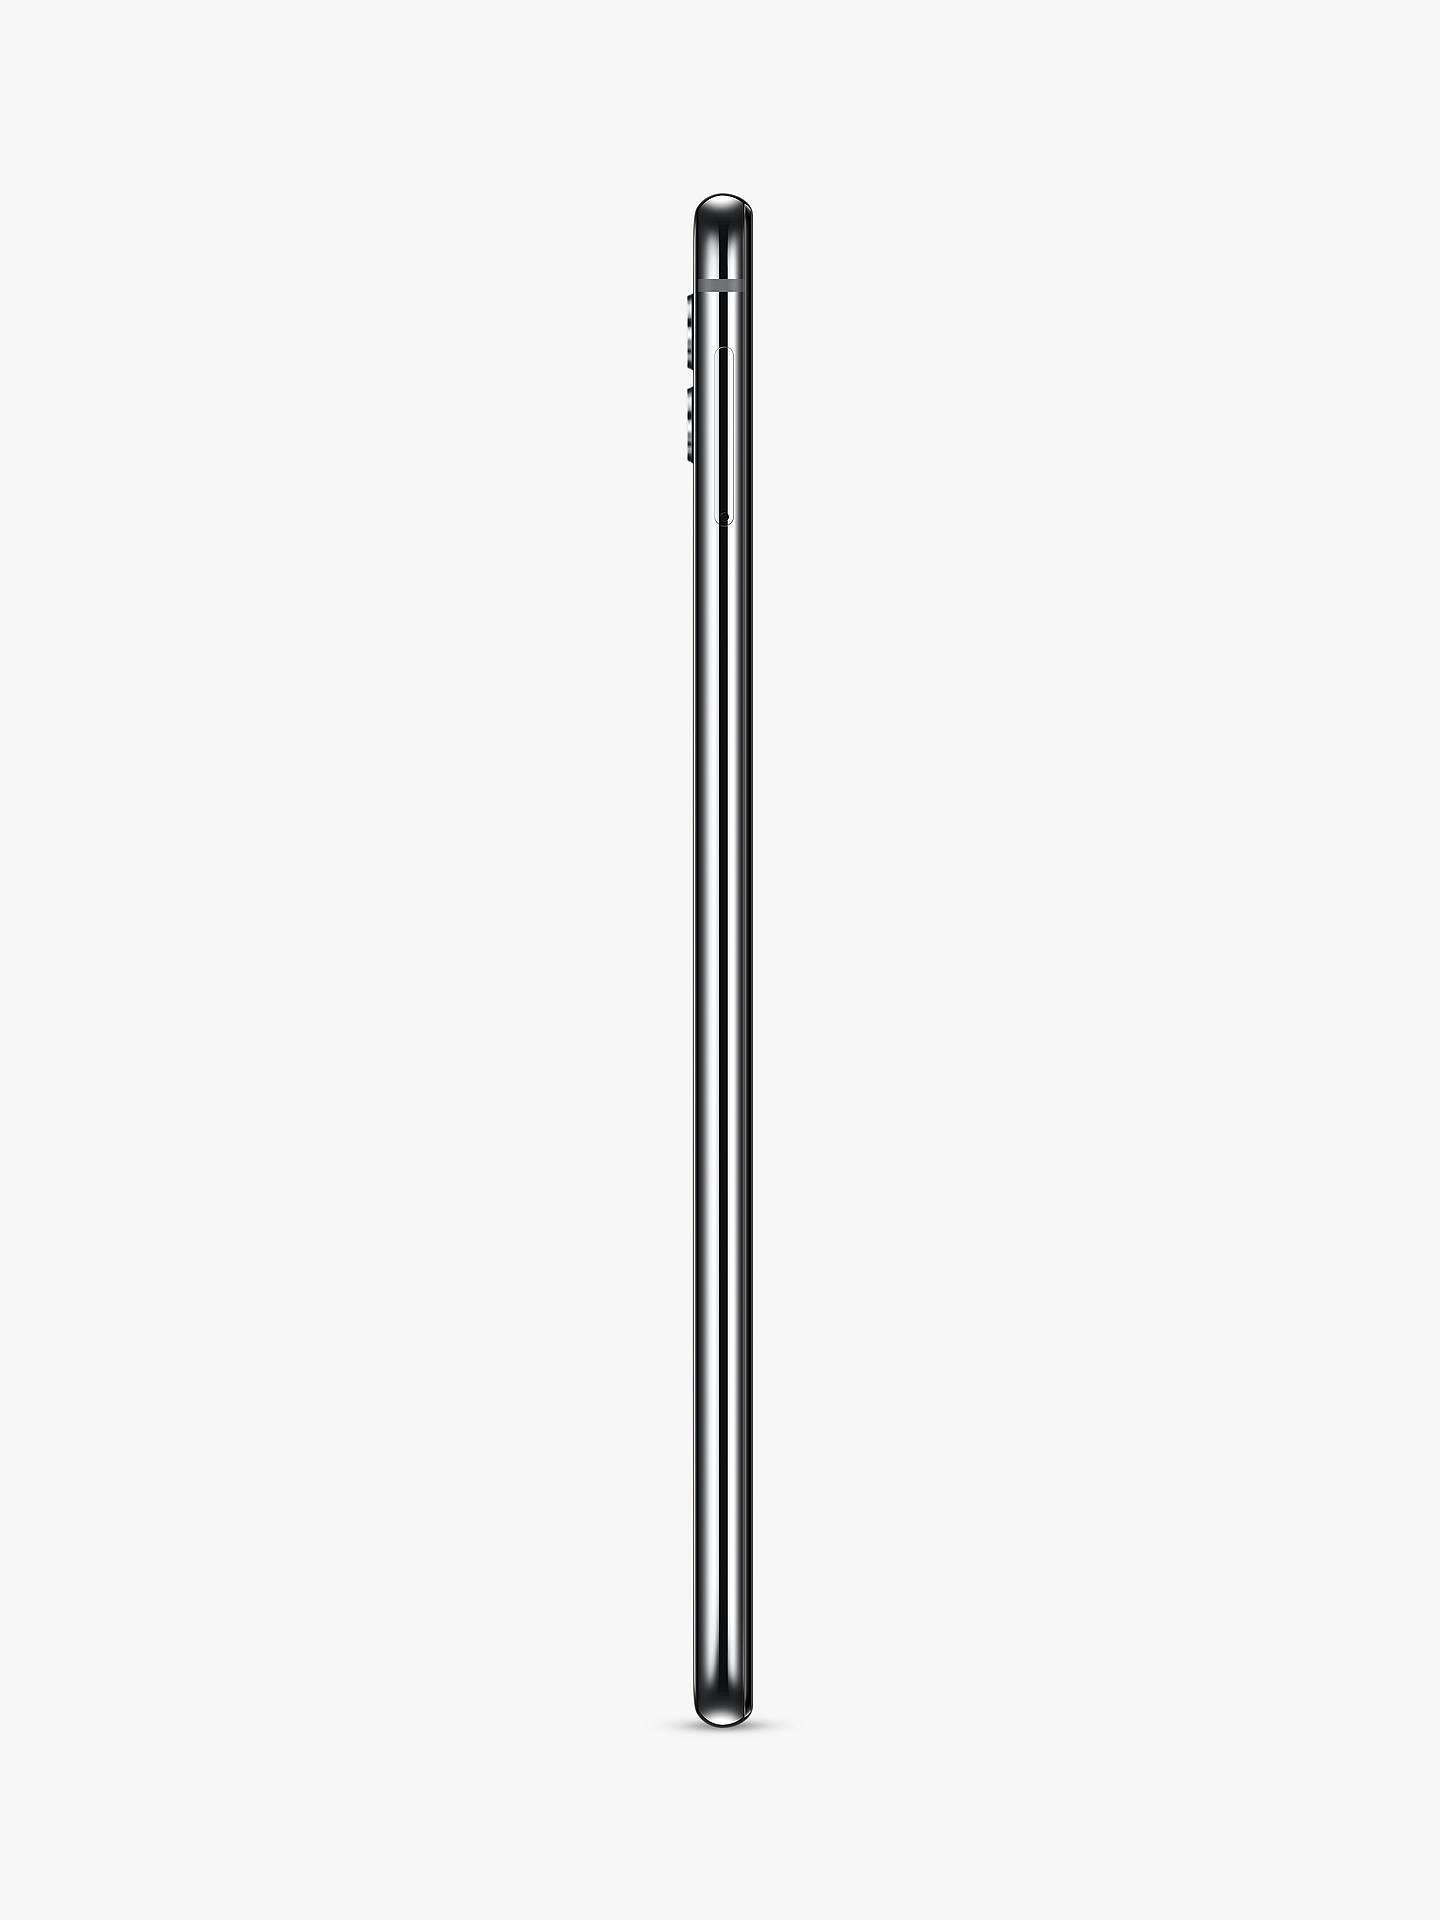 "Huawei Mate 20 Lite Smartphone, Android, 6 3"", 4G LTE, SIM Free, 64GB, Black"